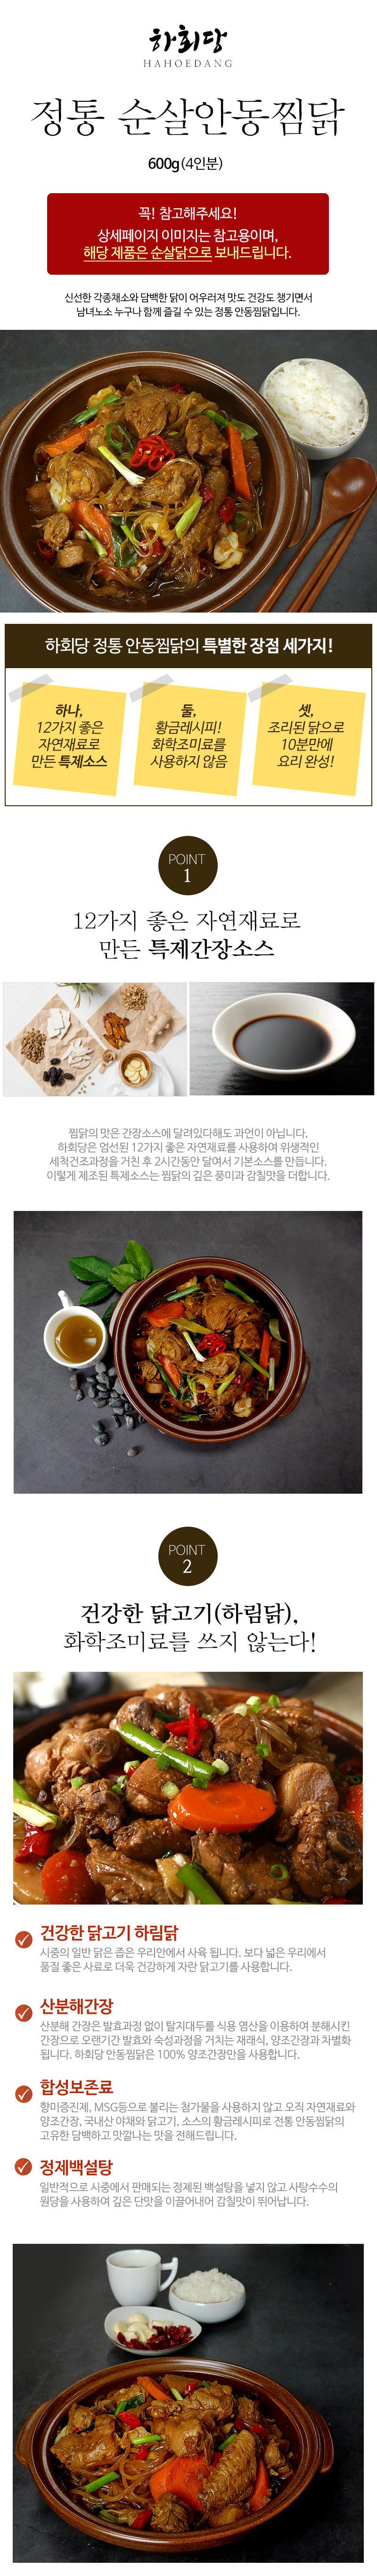 H-sunsal_andong-1_01.jpg